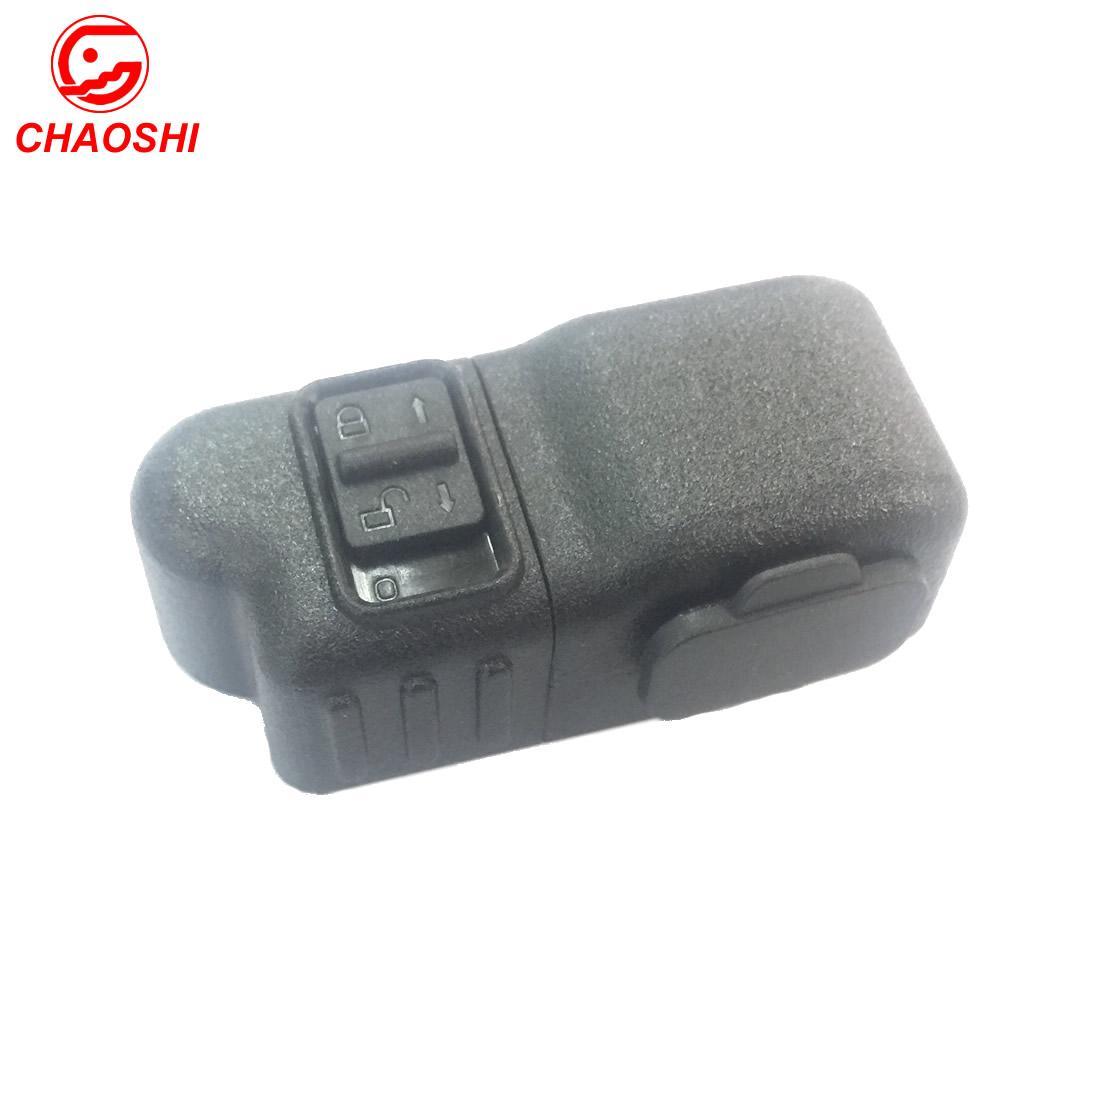 Audio adaptor for DEP550, XPR3550, DP2400 1